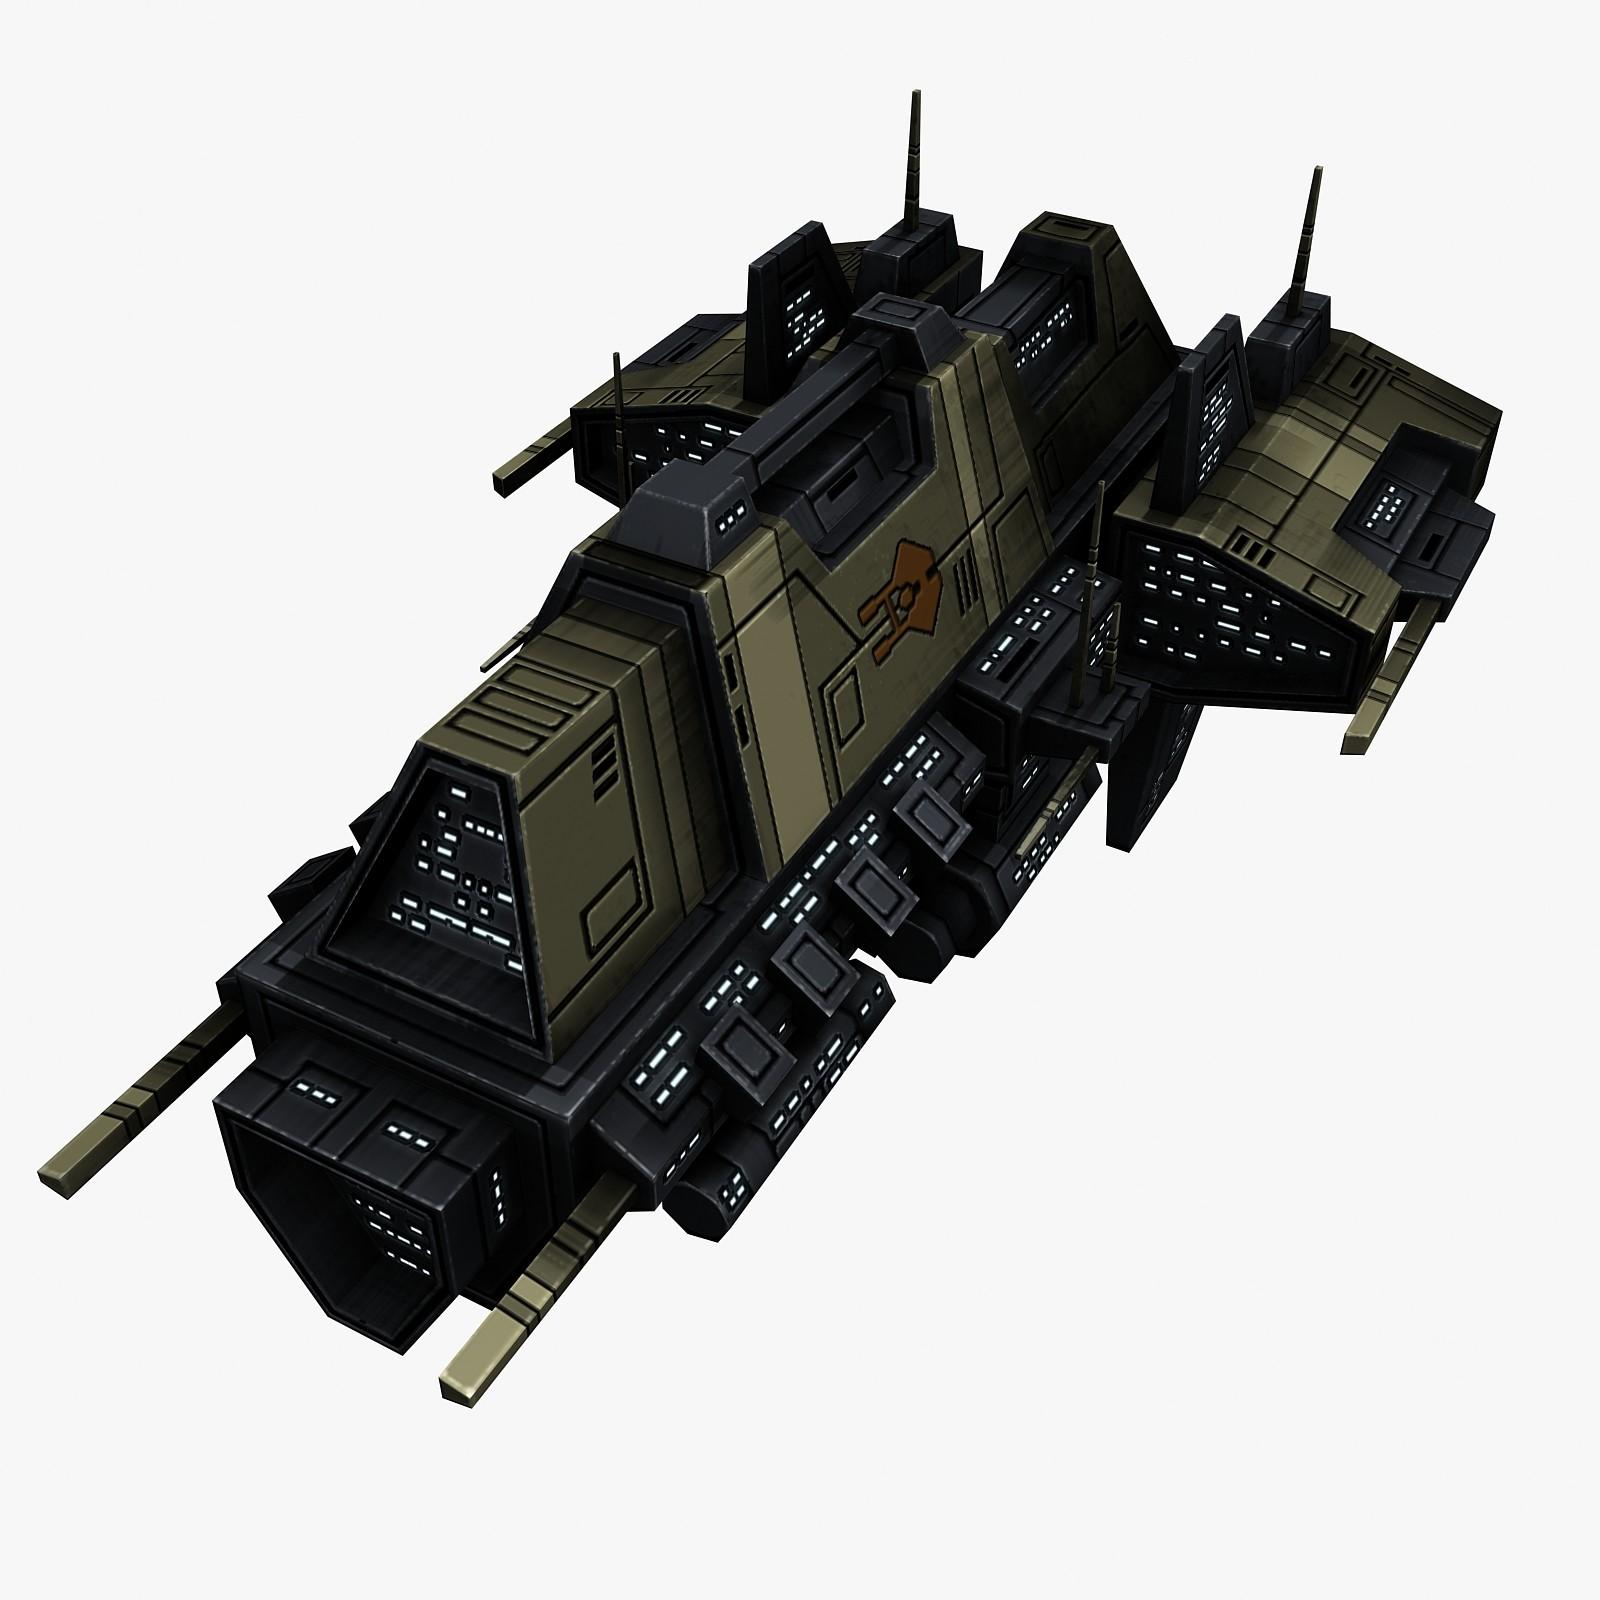 civilian_transport_spaceship_1_preview_1.jpg